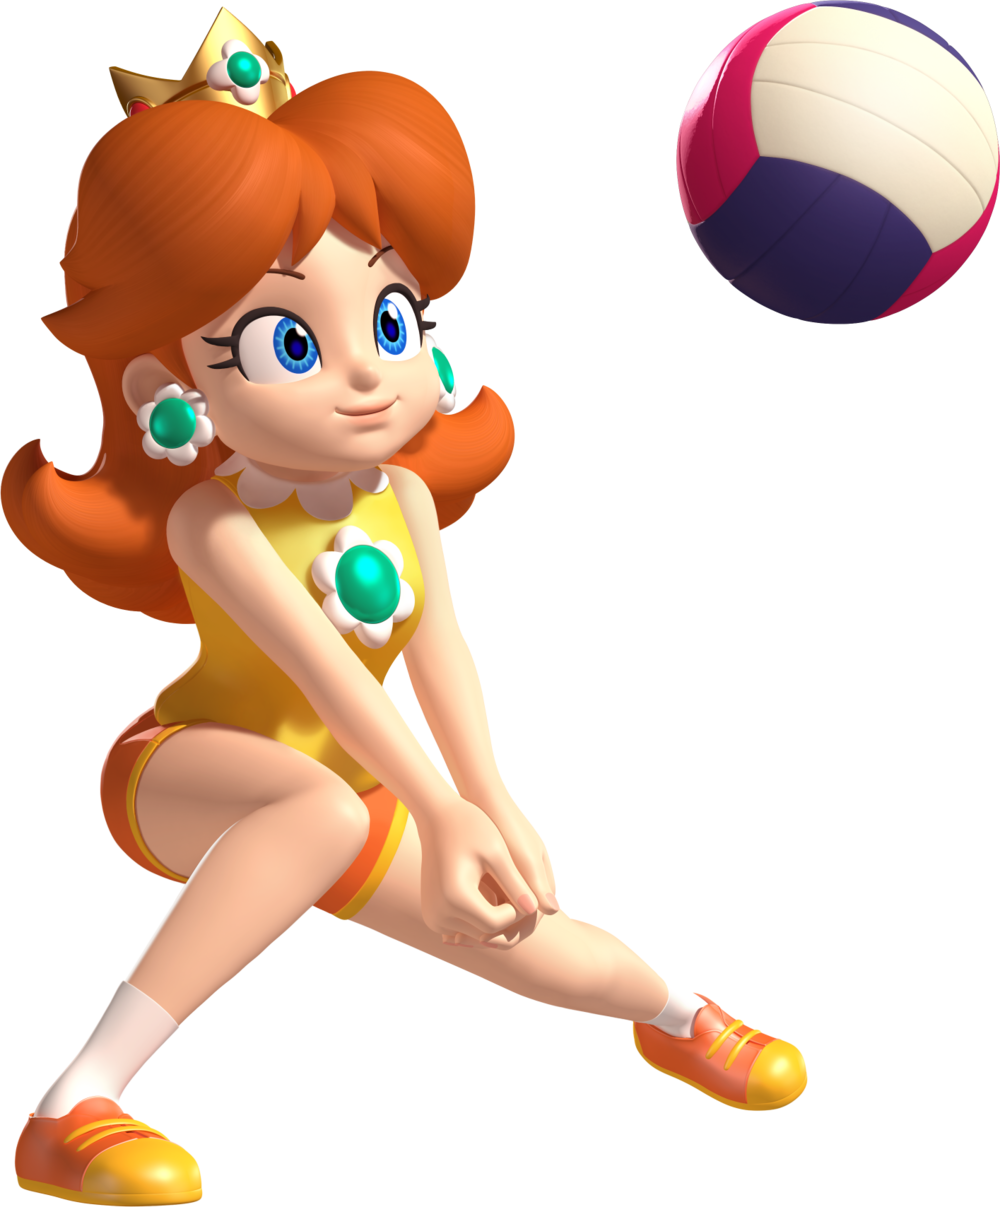 Clipart kids playing volleyball baseball games jpg free stock Princess Peach (Sports) | Pinterest | Sports mix, Princess daisy and ... jpg free stock